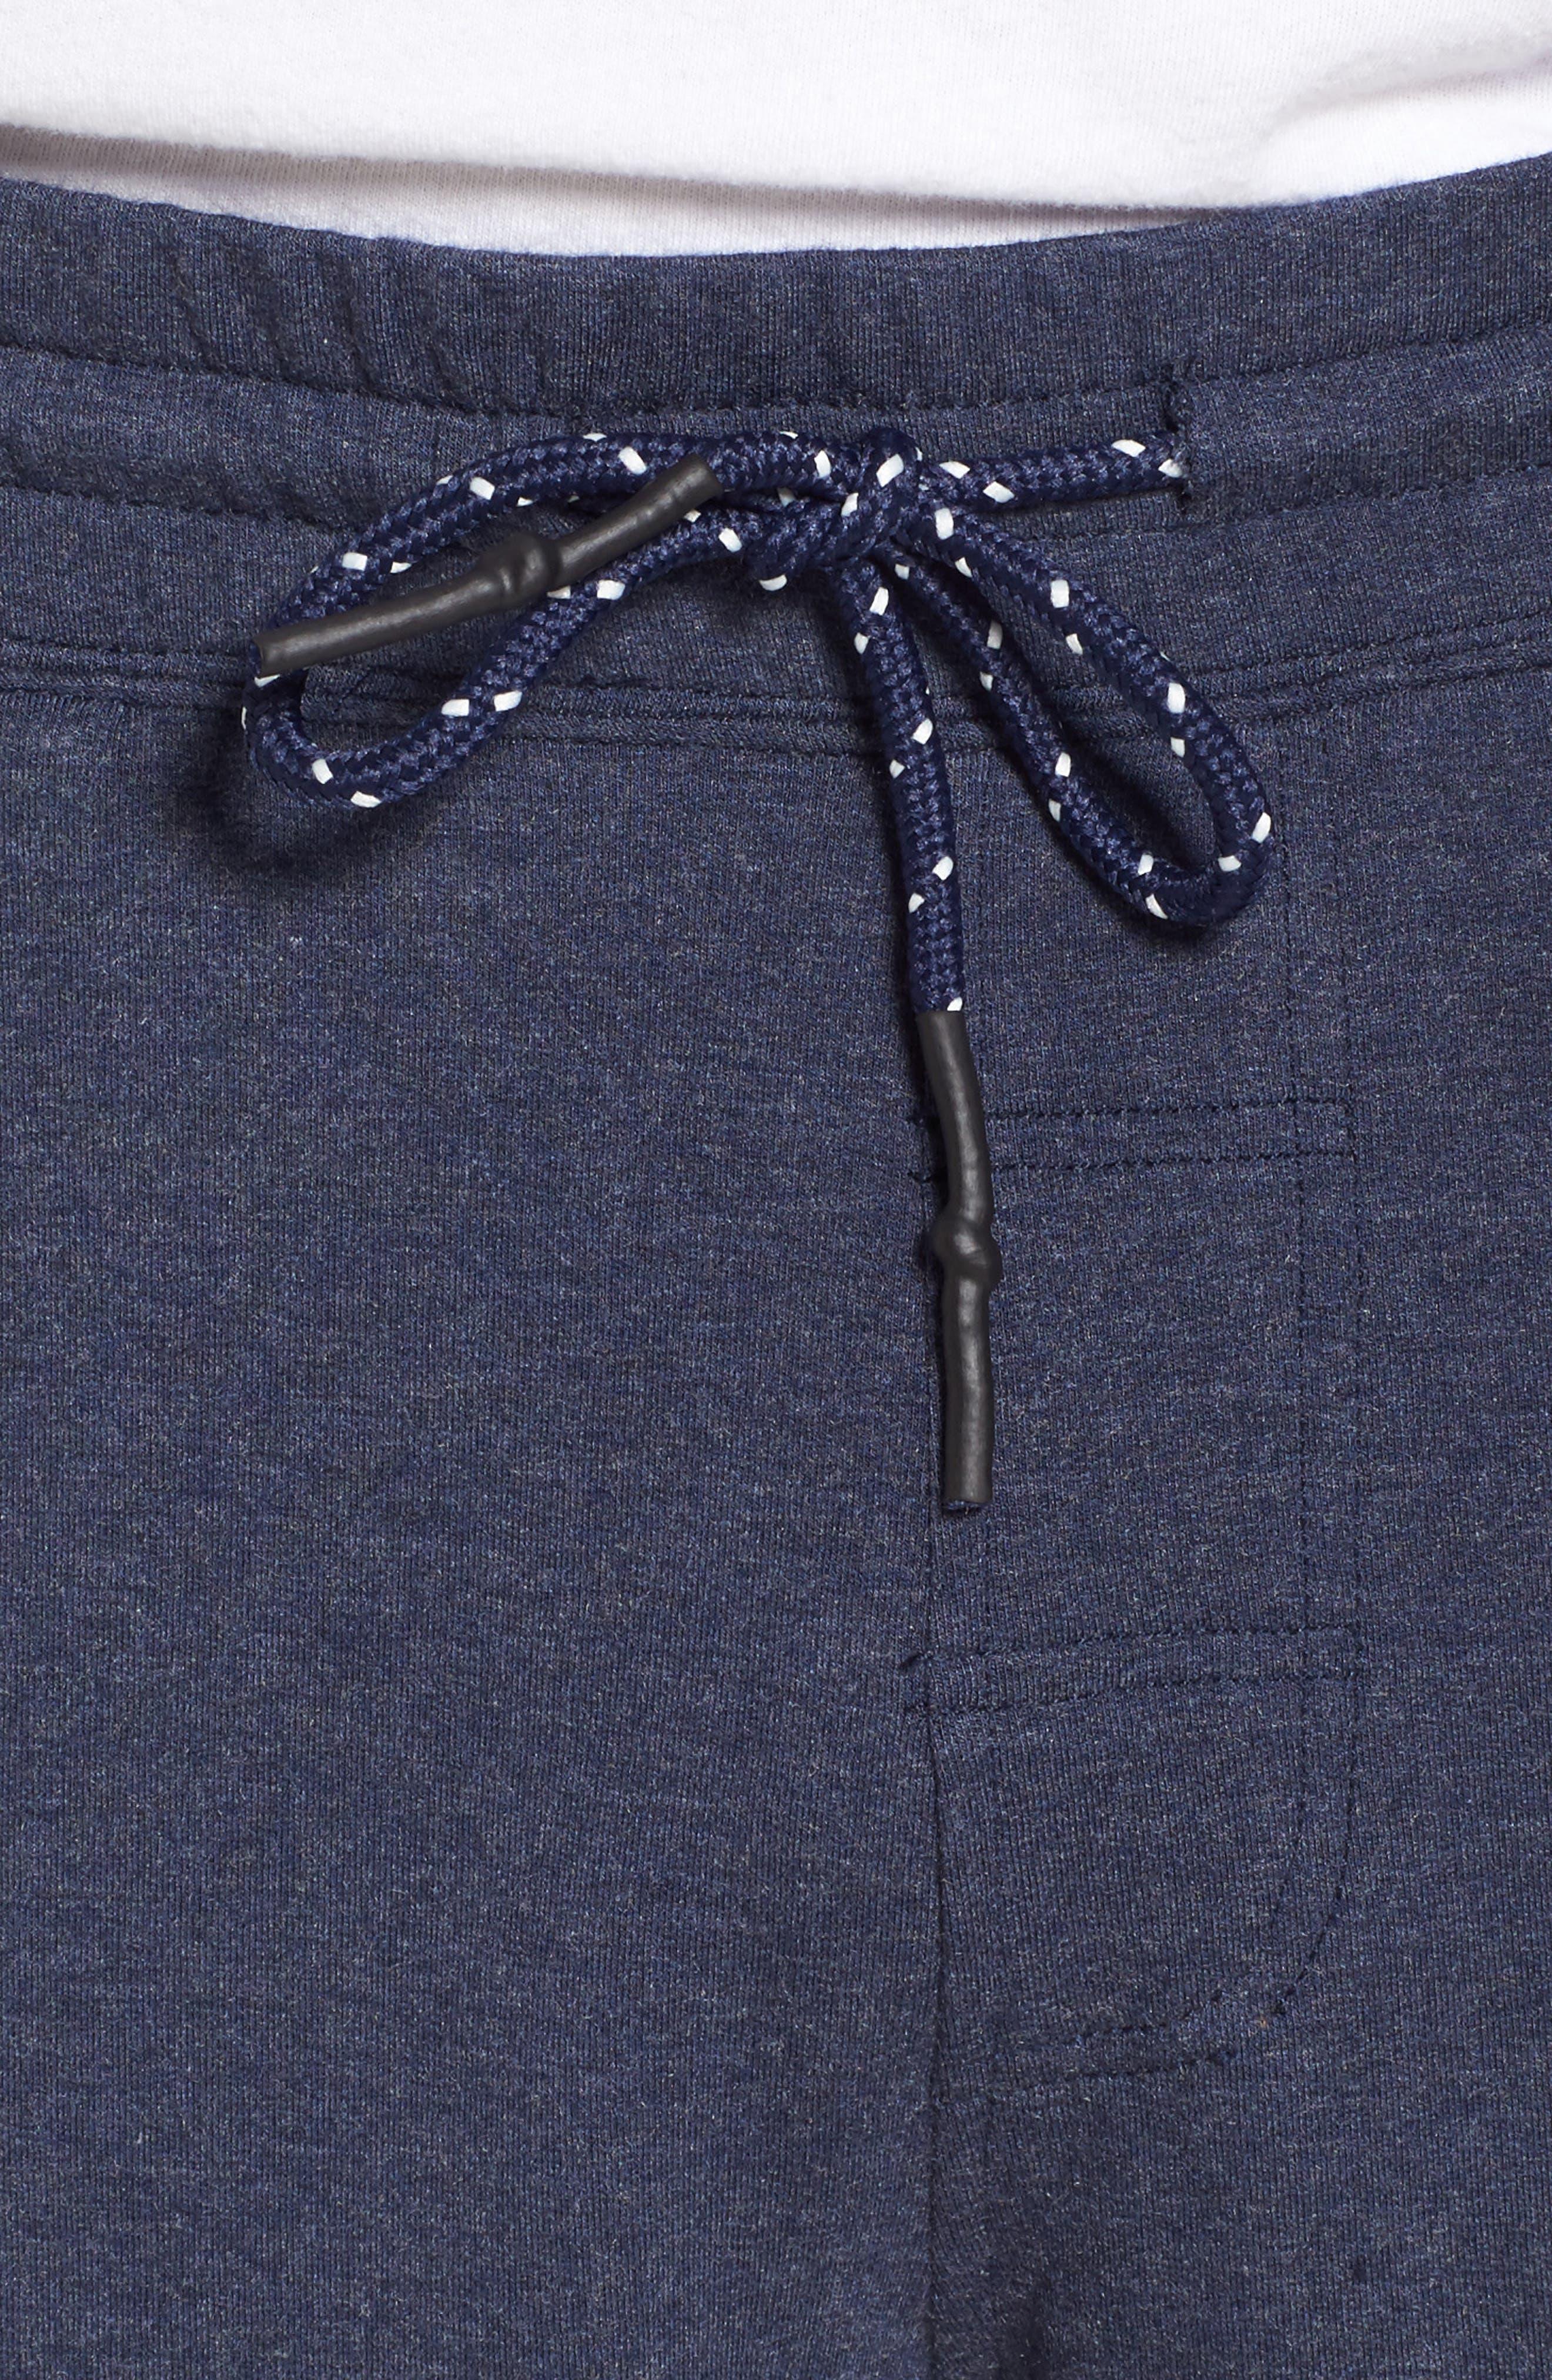 Brushback Fleece Shorts,                             Alternate thumbnail 4, color,                             Navy Heather